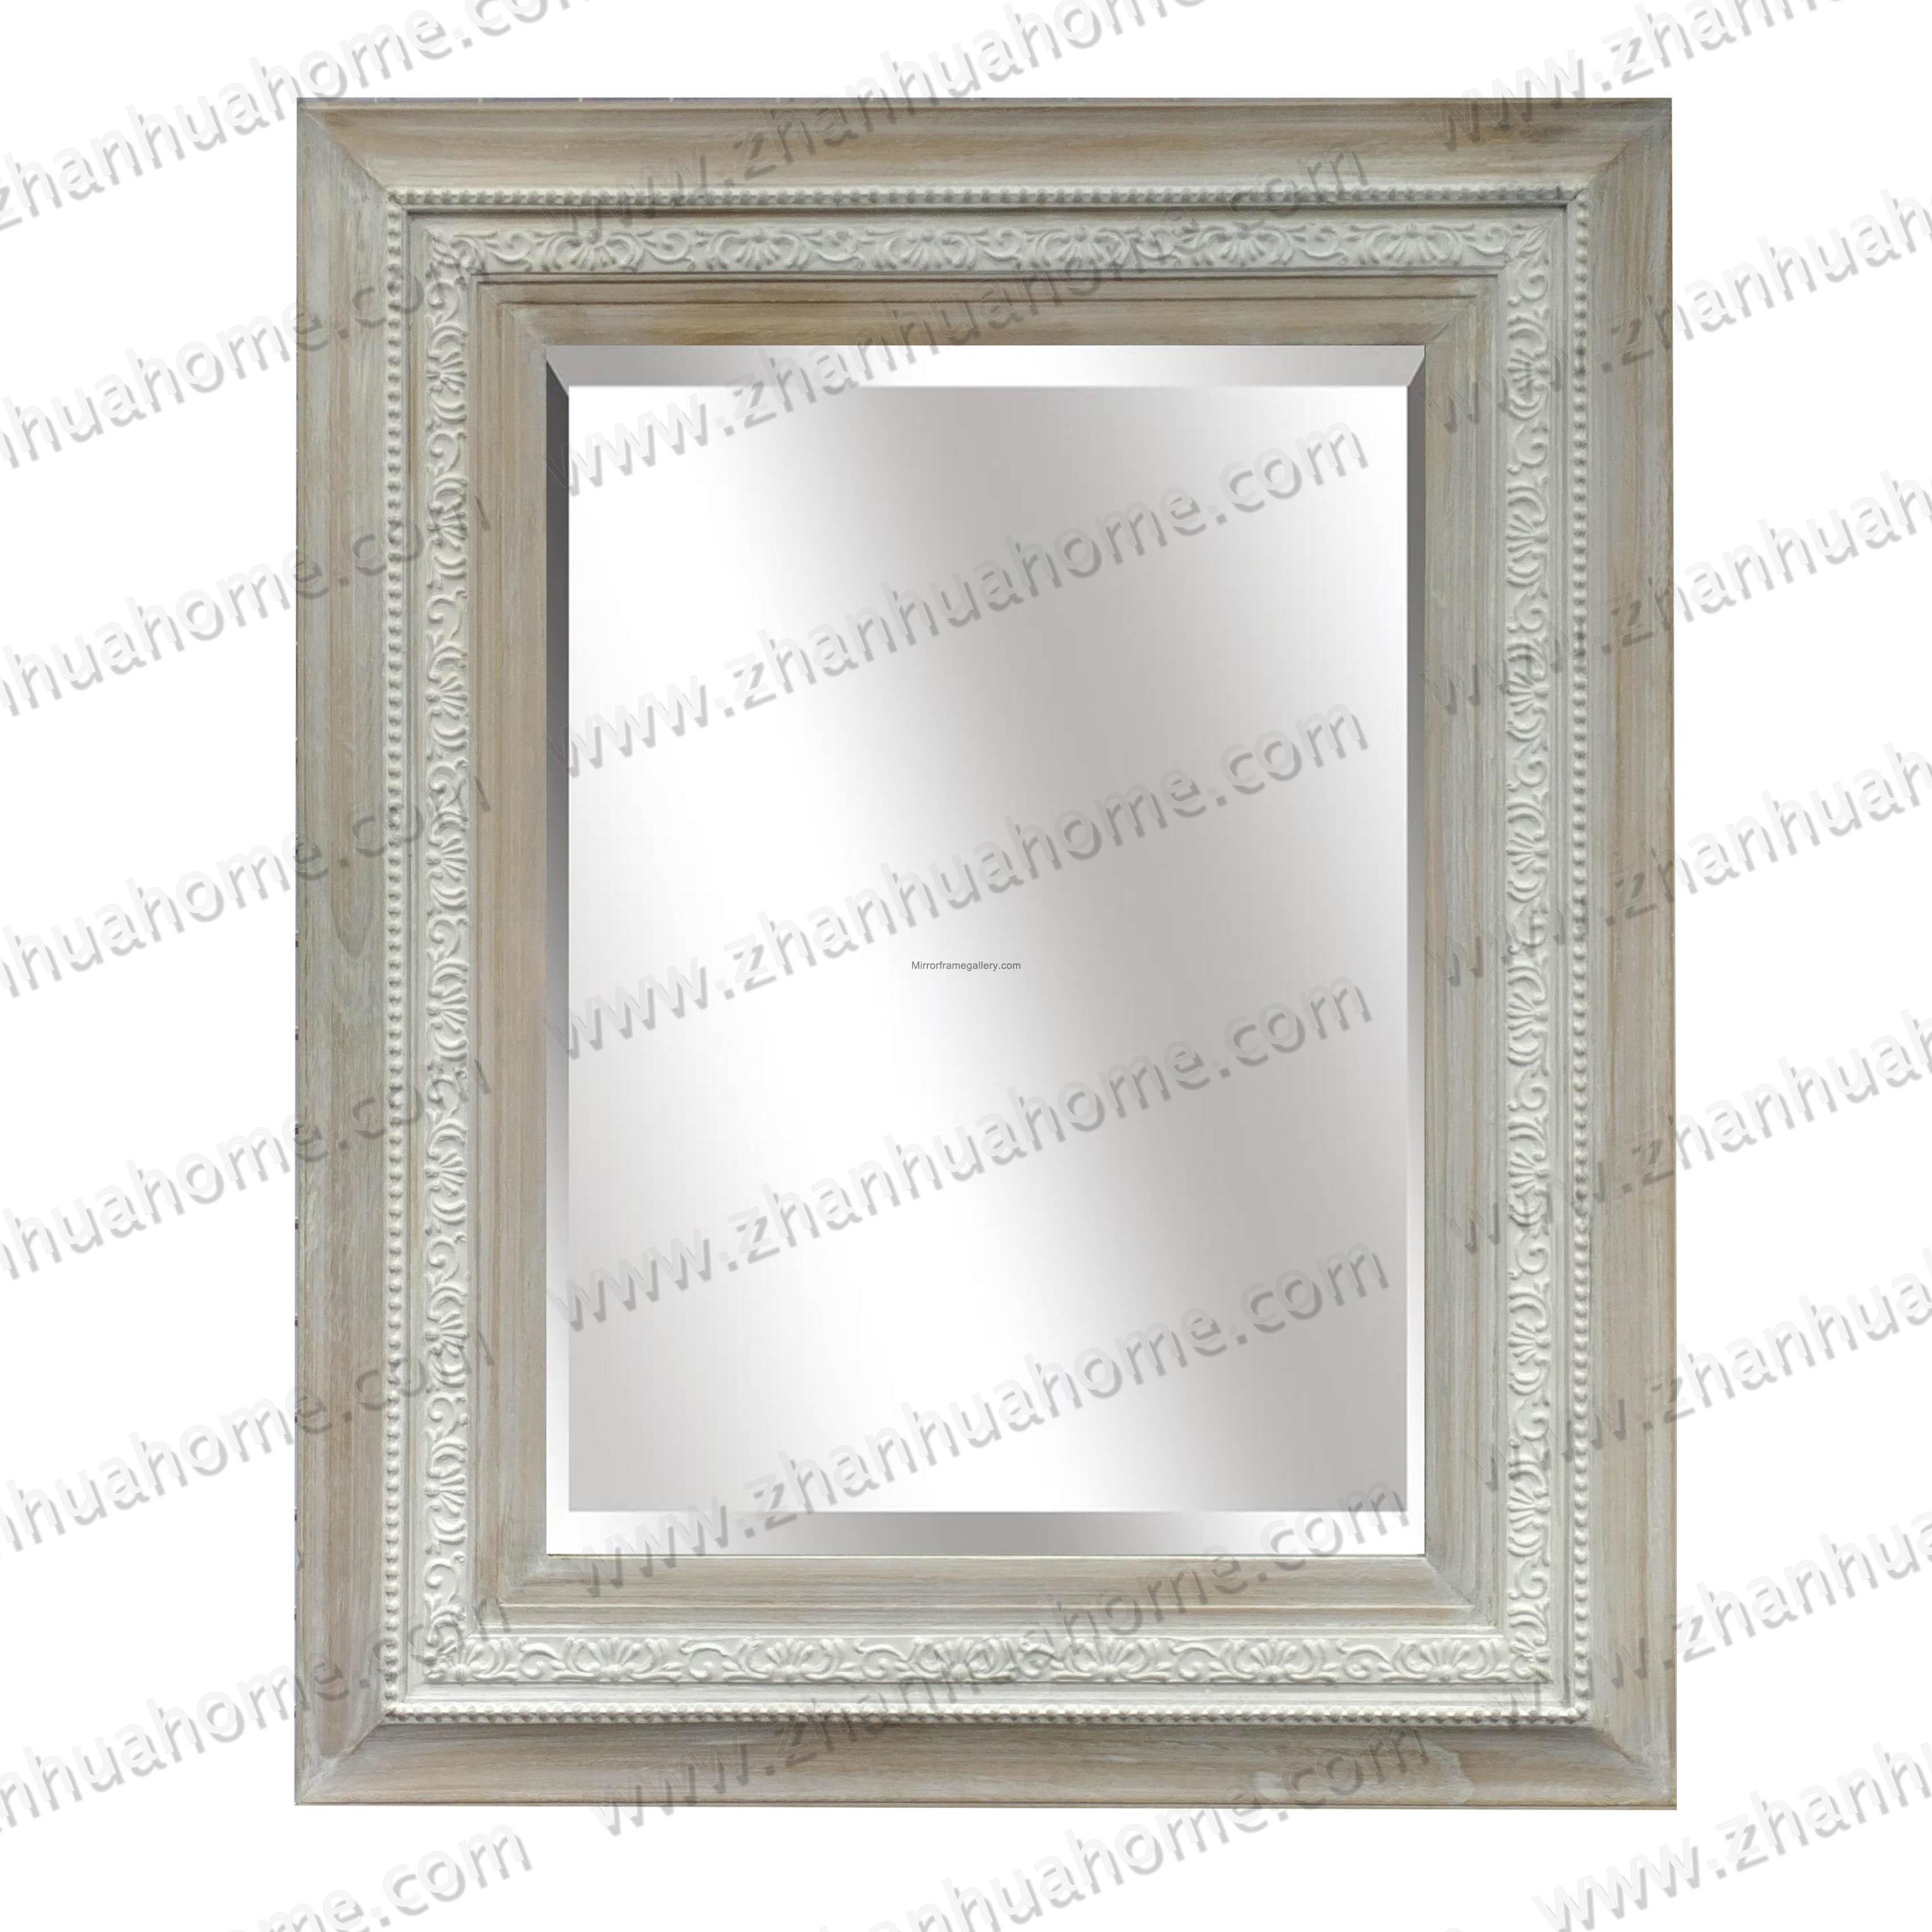 Burlywood Frame With